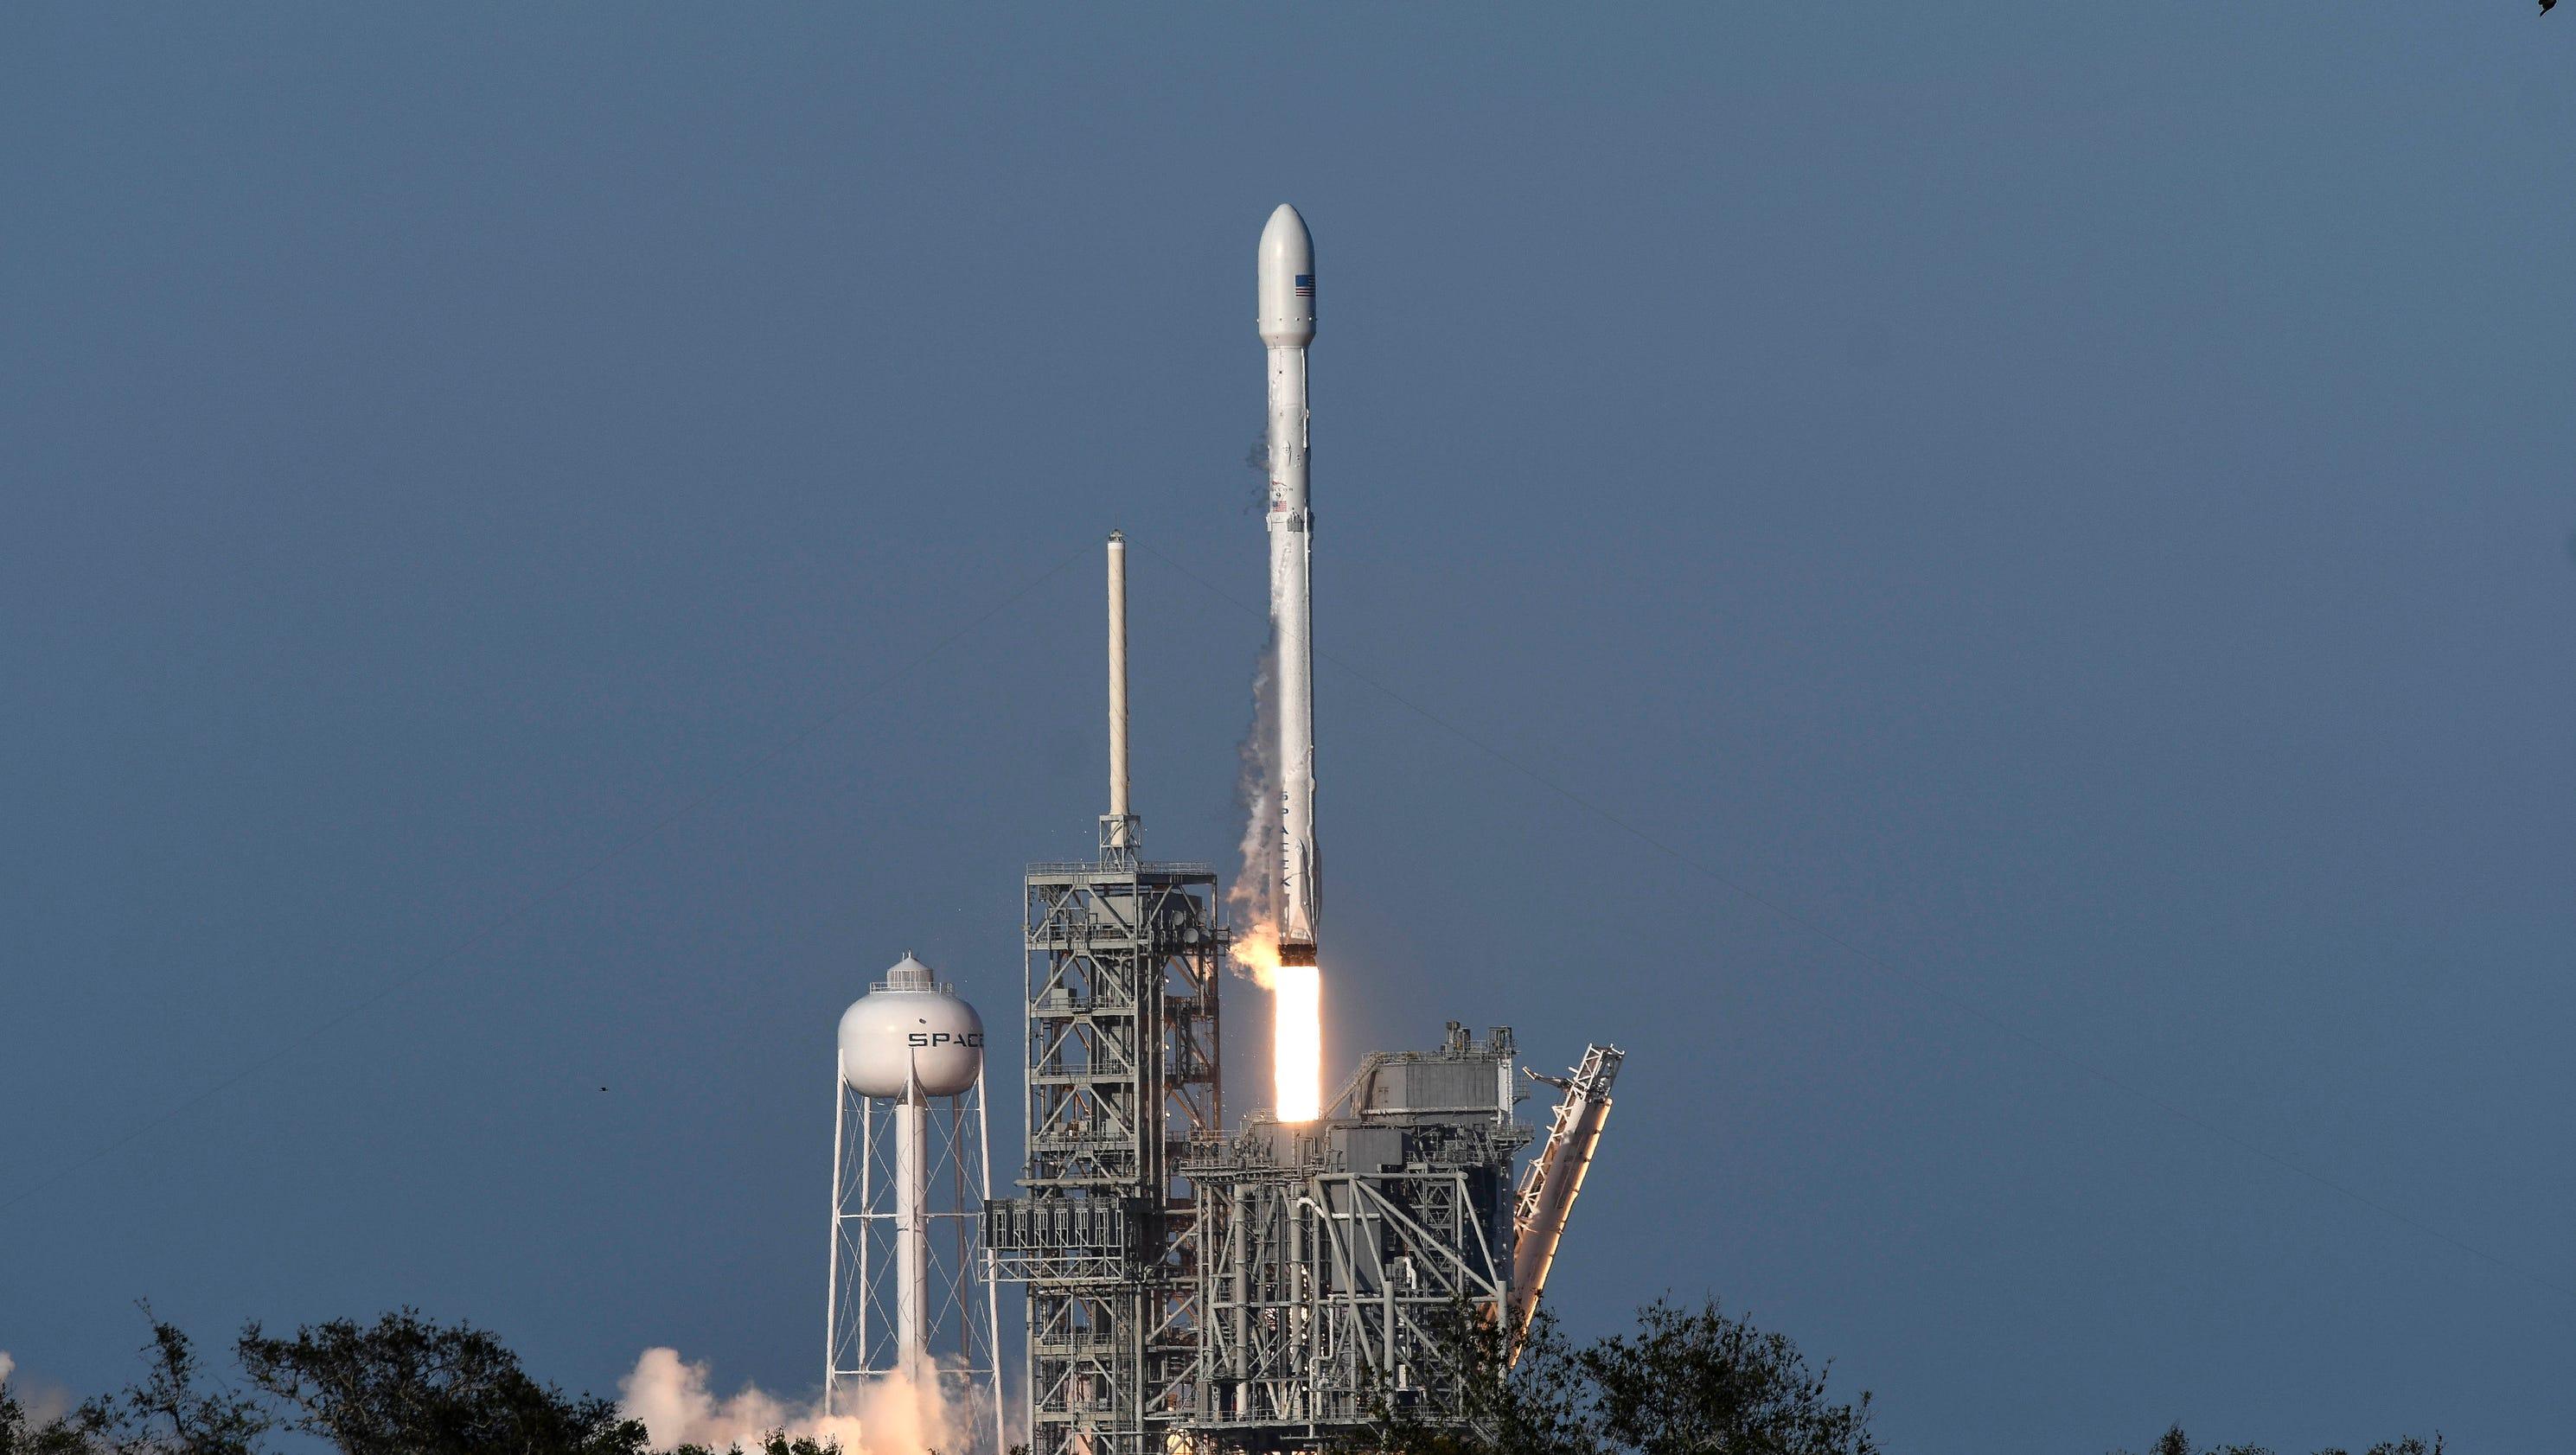 spacex rocket in flight - photo #21